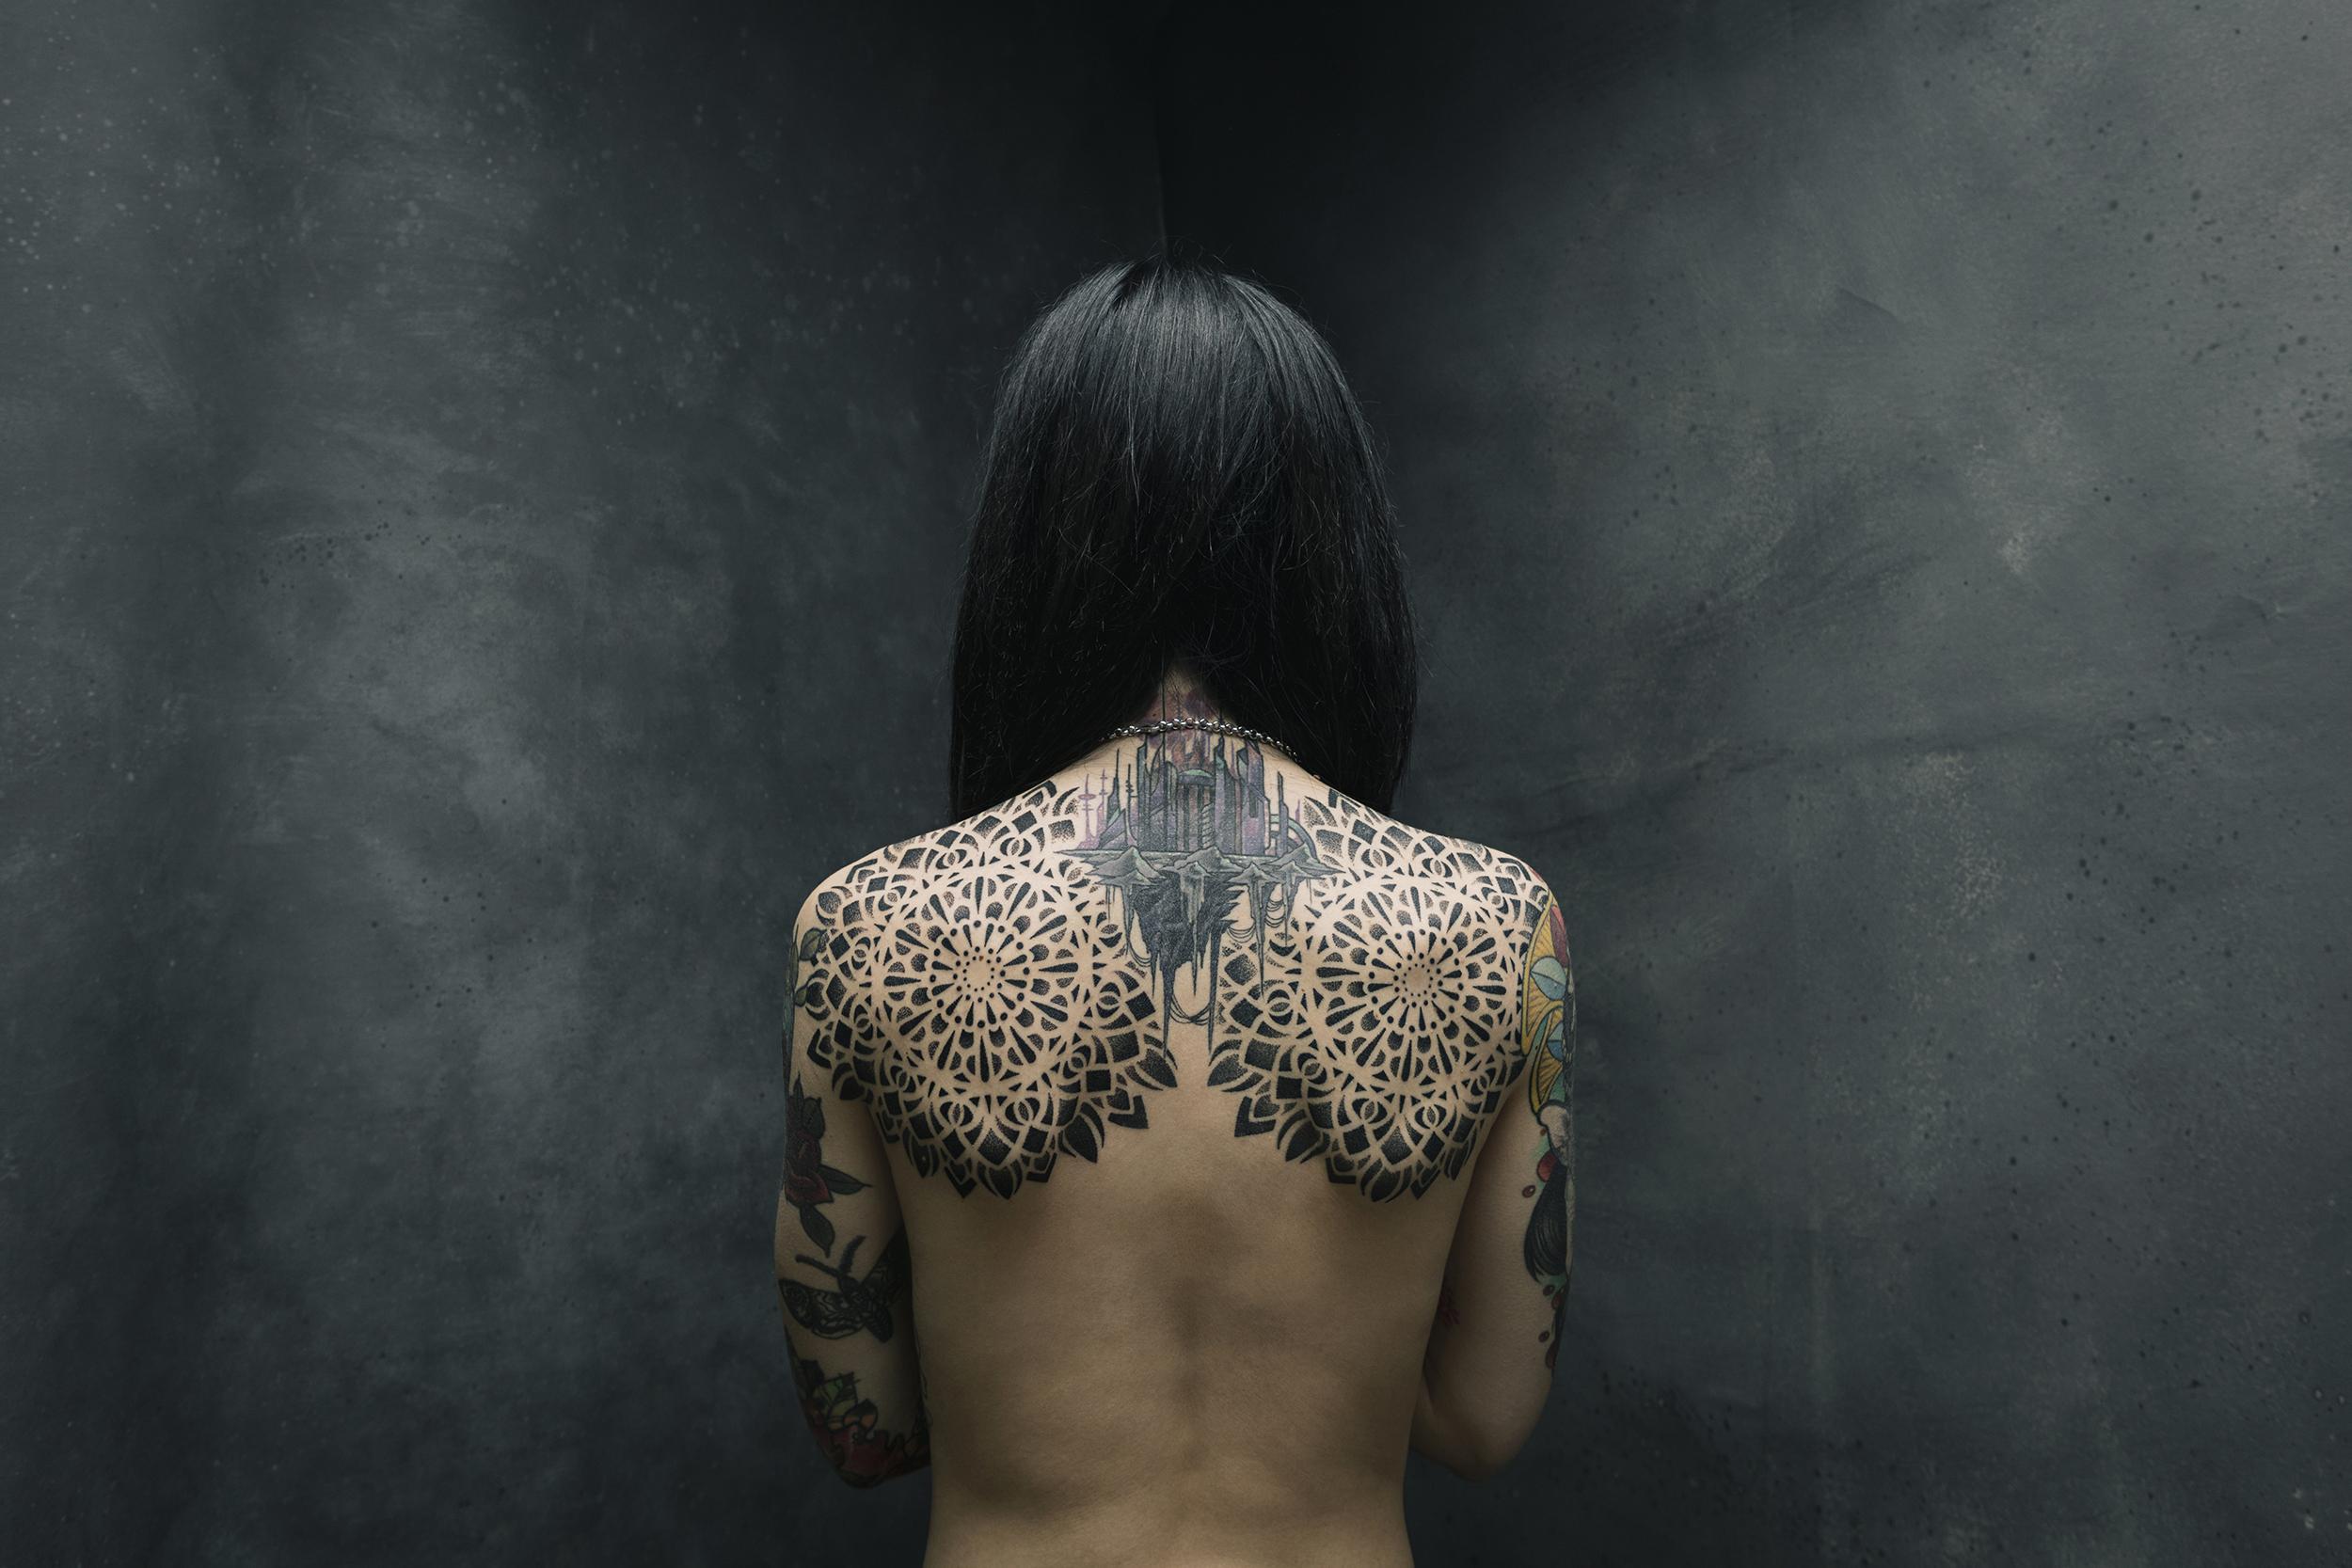 giorgio-leone-institutional-corporate-skin-frame-tattoo-artist-portrait-barbara-buchignani-2.jpg